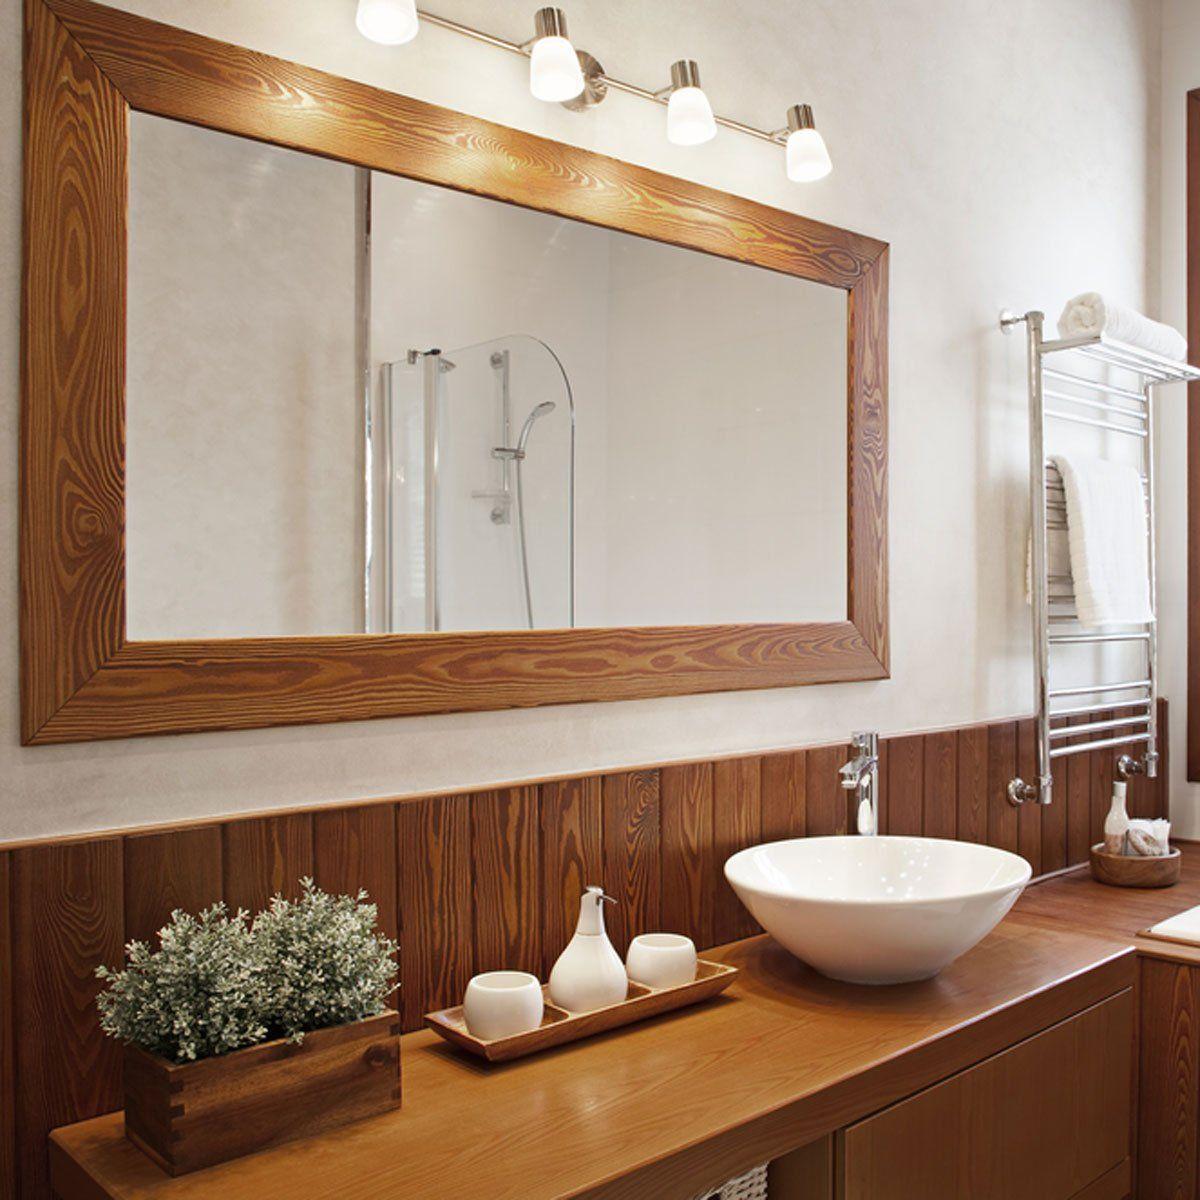 large simple bathroom mirror mirrors heavy hanging modern kitchens 2020